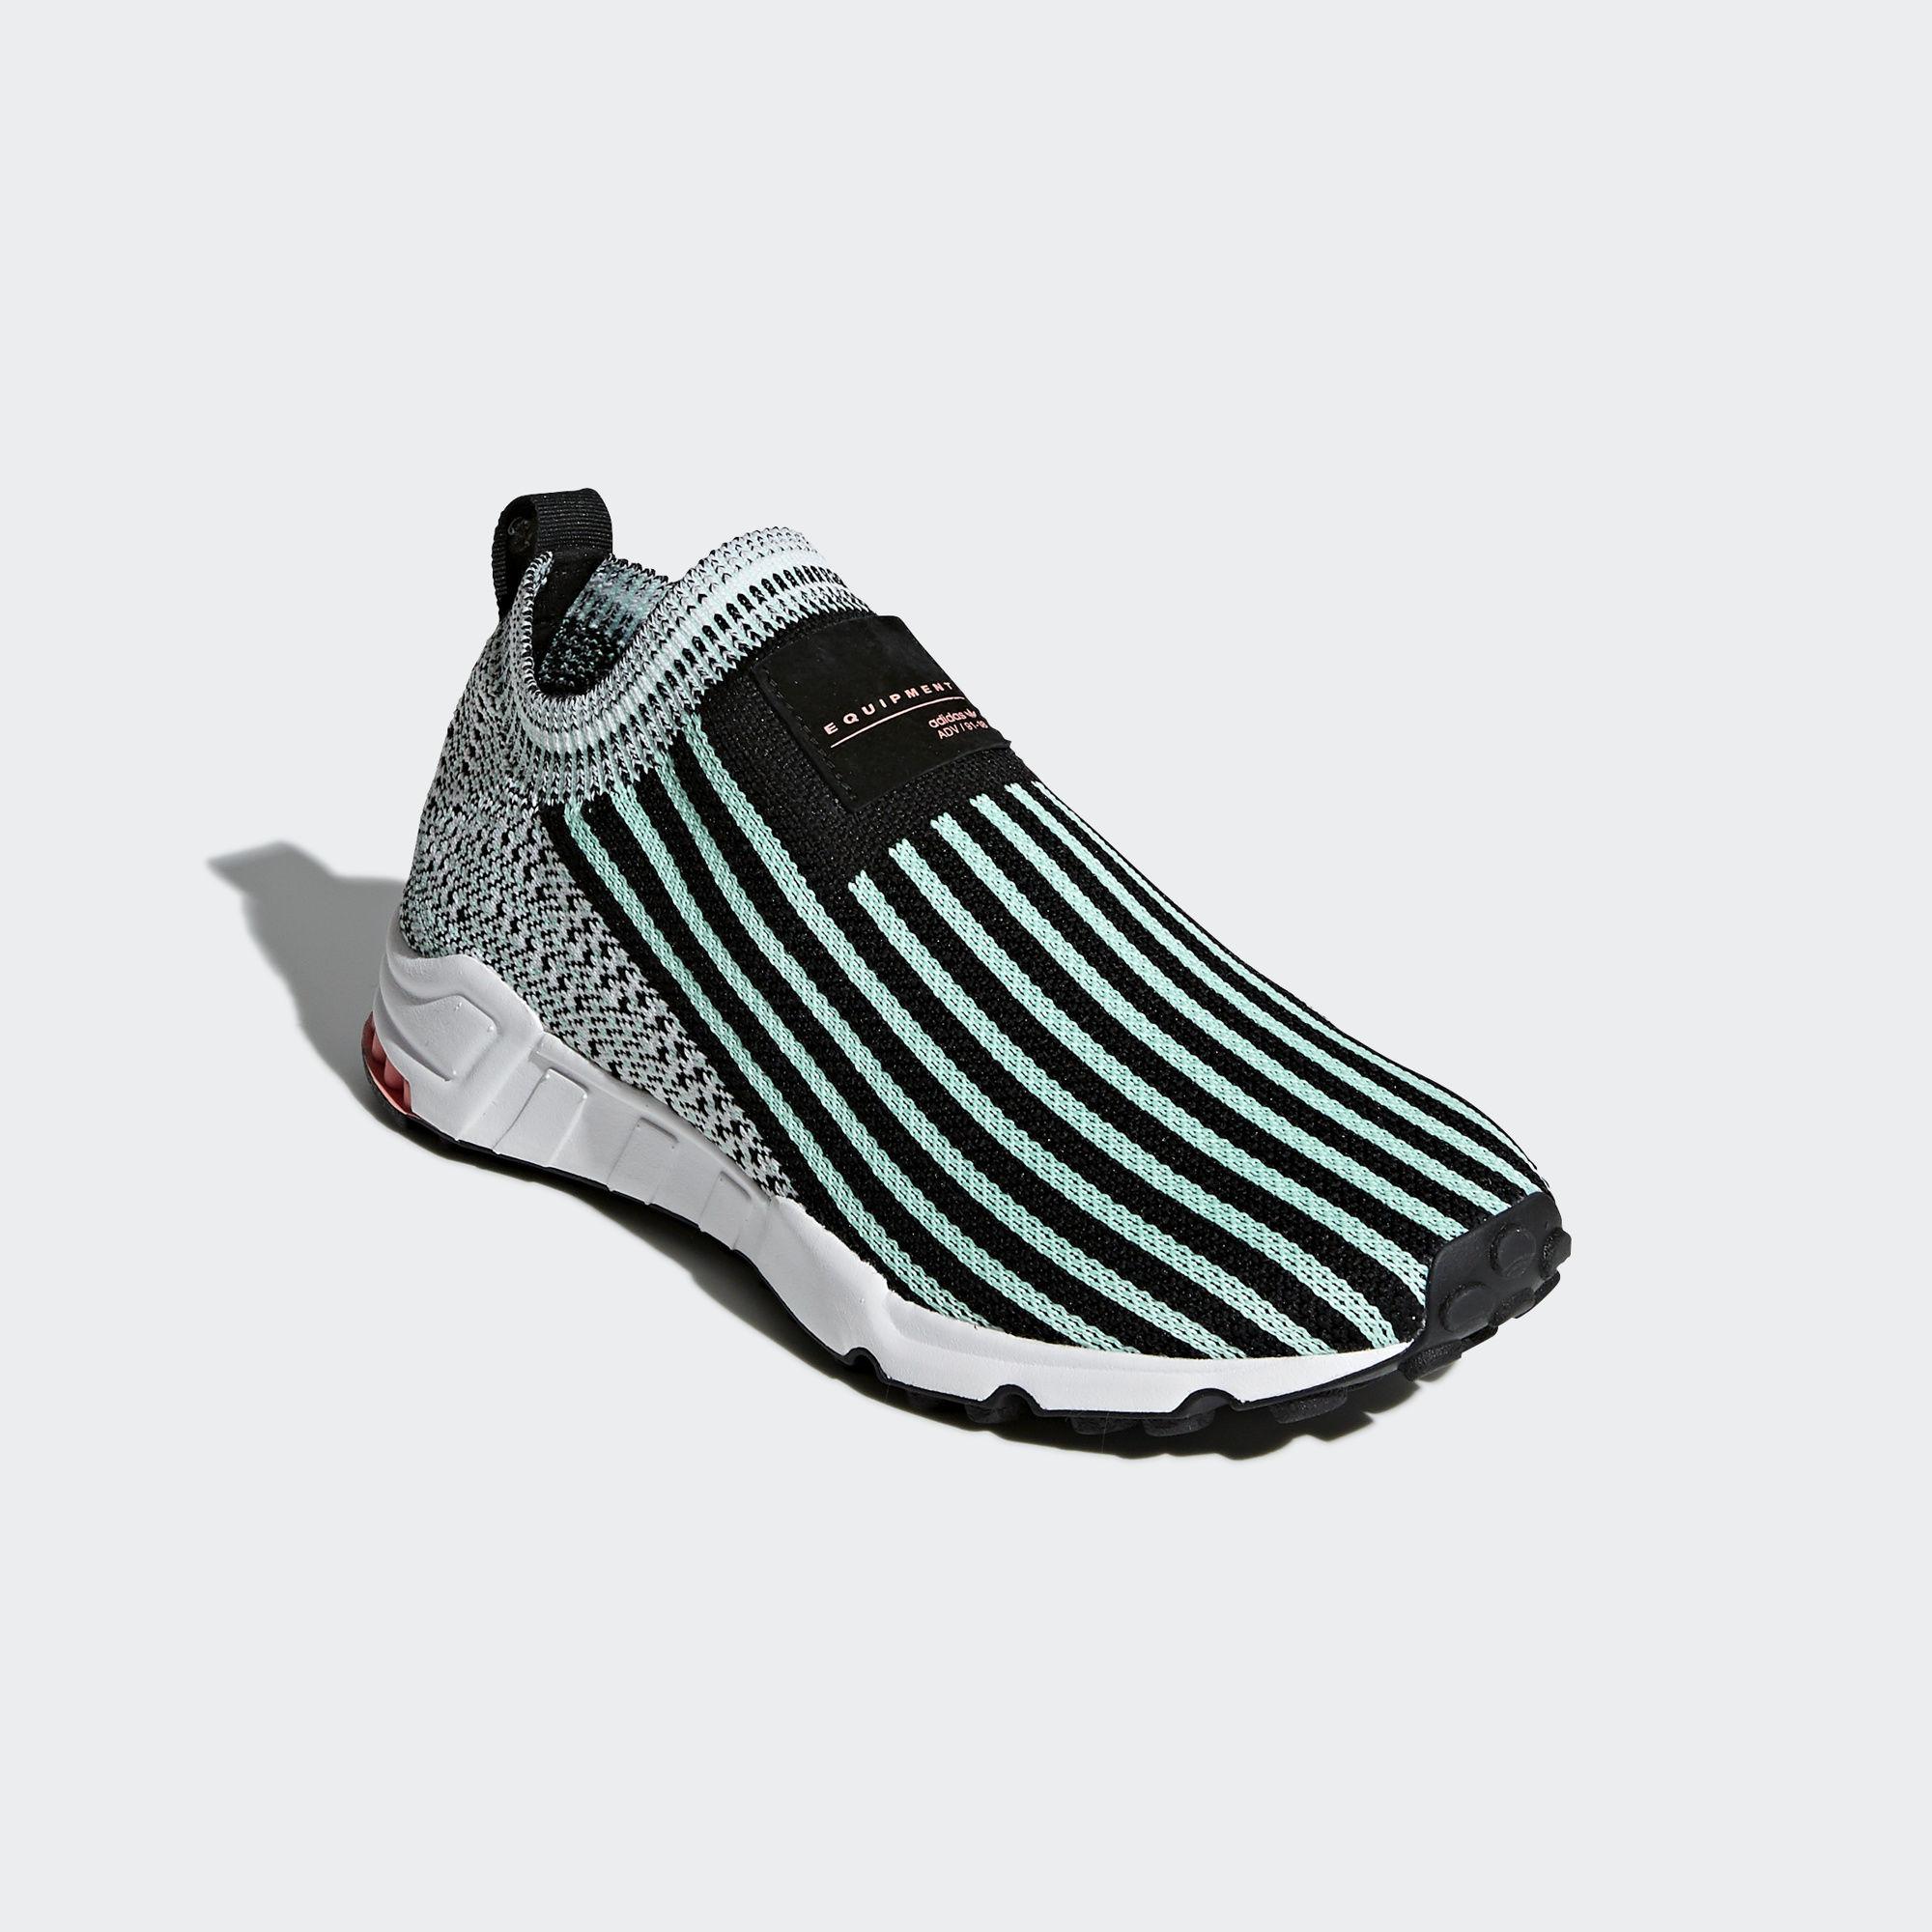 adidas EQT Support Sock Core Black / Clear Mint / Ftwr White (B37530)